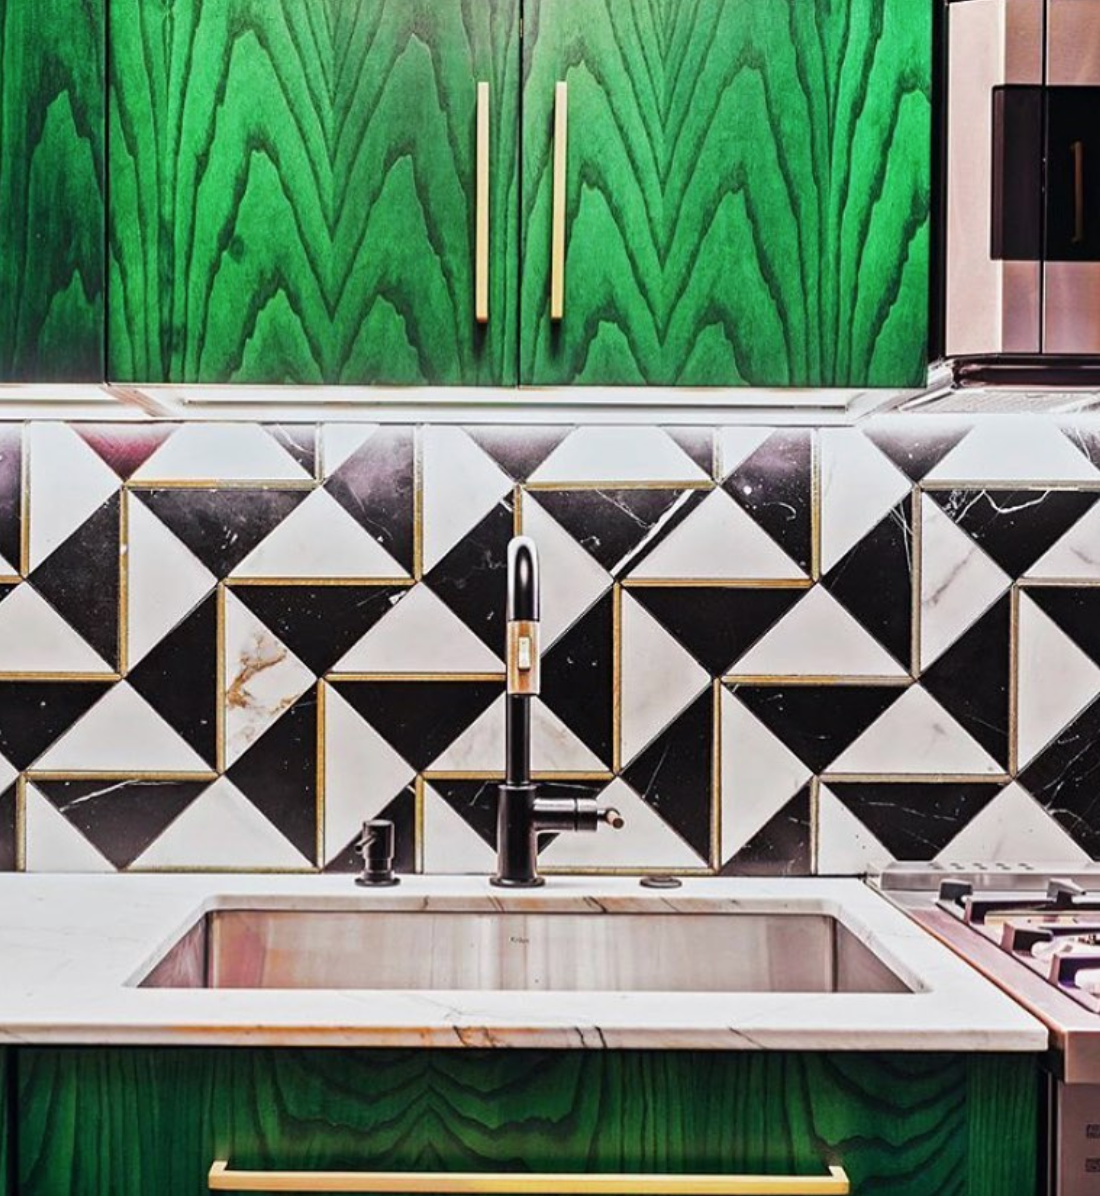 Kitchen Splashback Ideas: 5 Tiles You'll Love